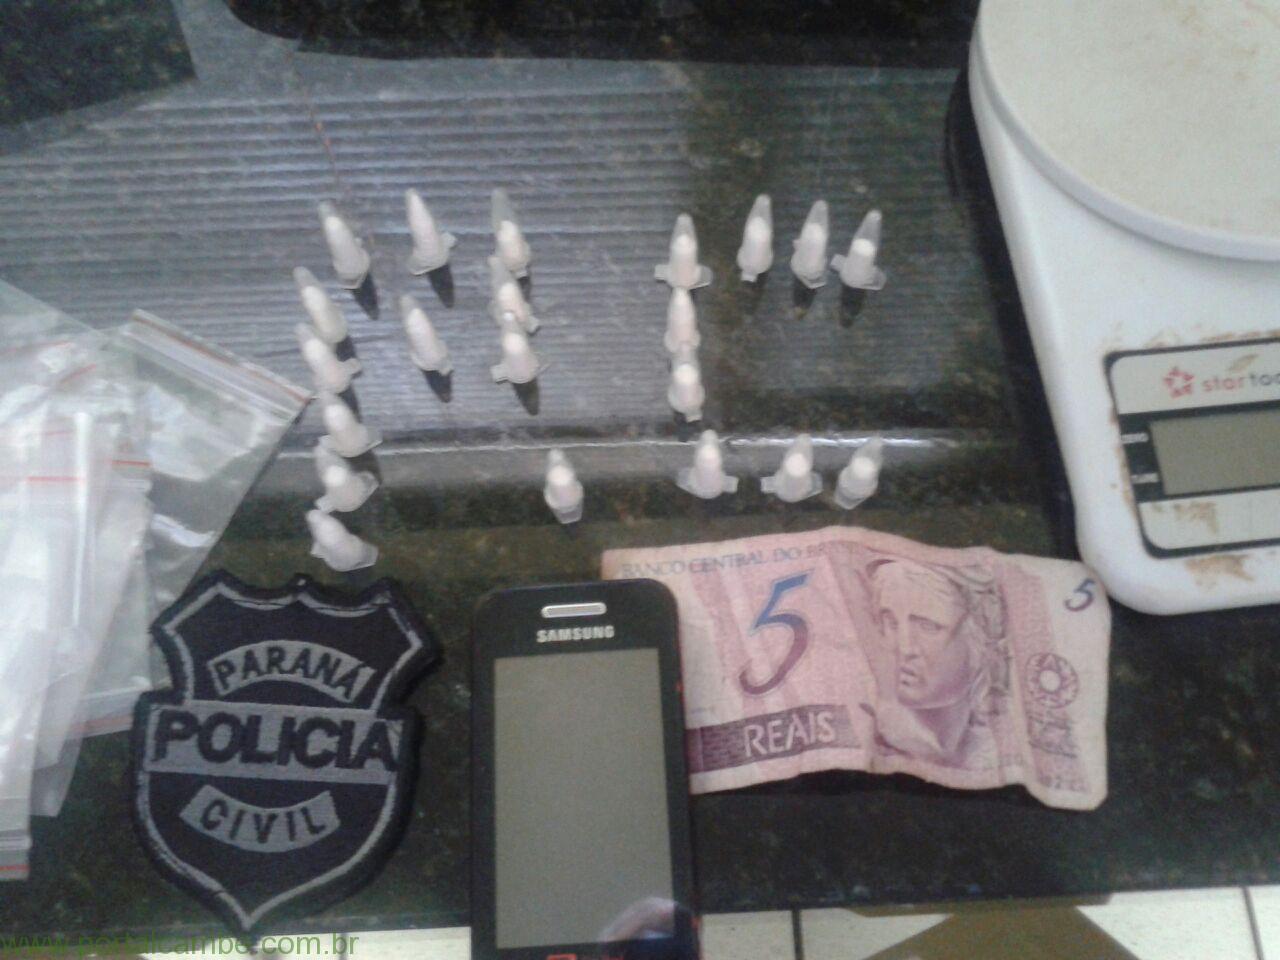 Polícia Civil apreende menor com 21 pinos de cocaína no Jardim Campos Verdes (Vídeo)